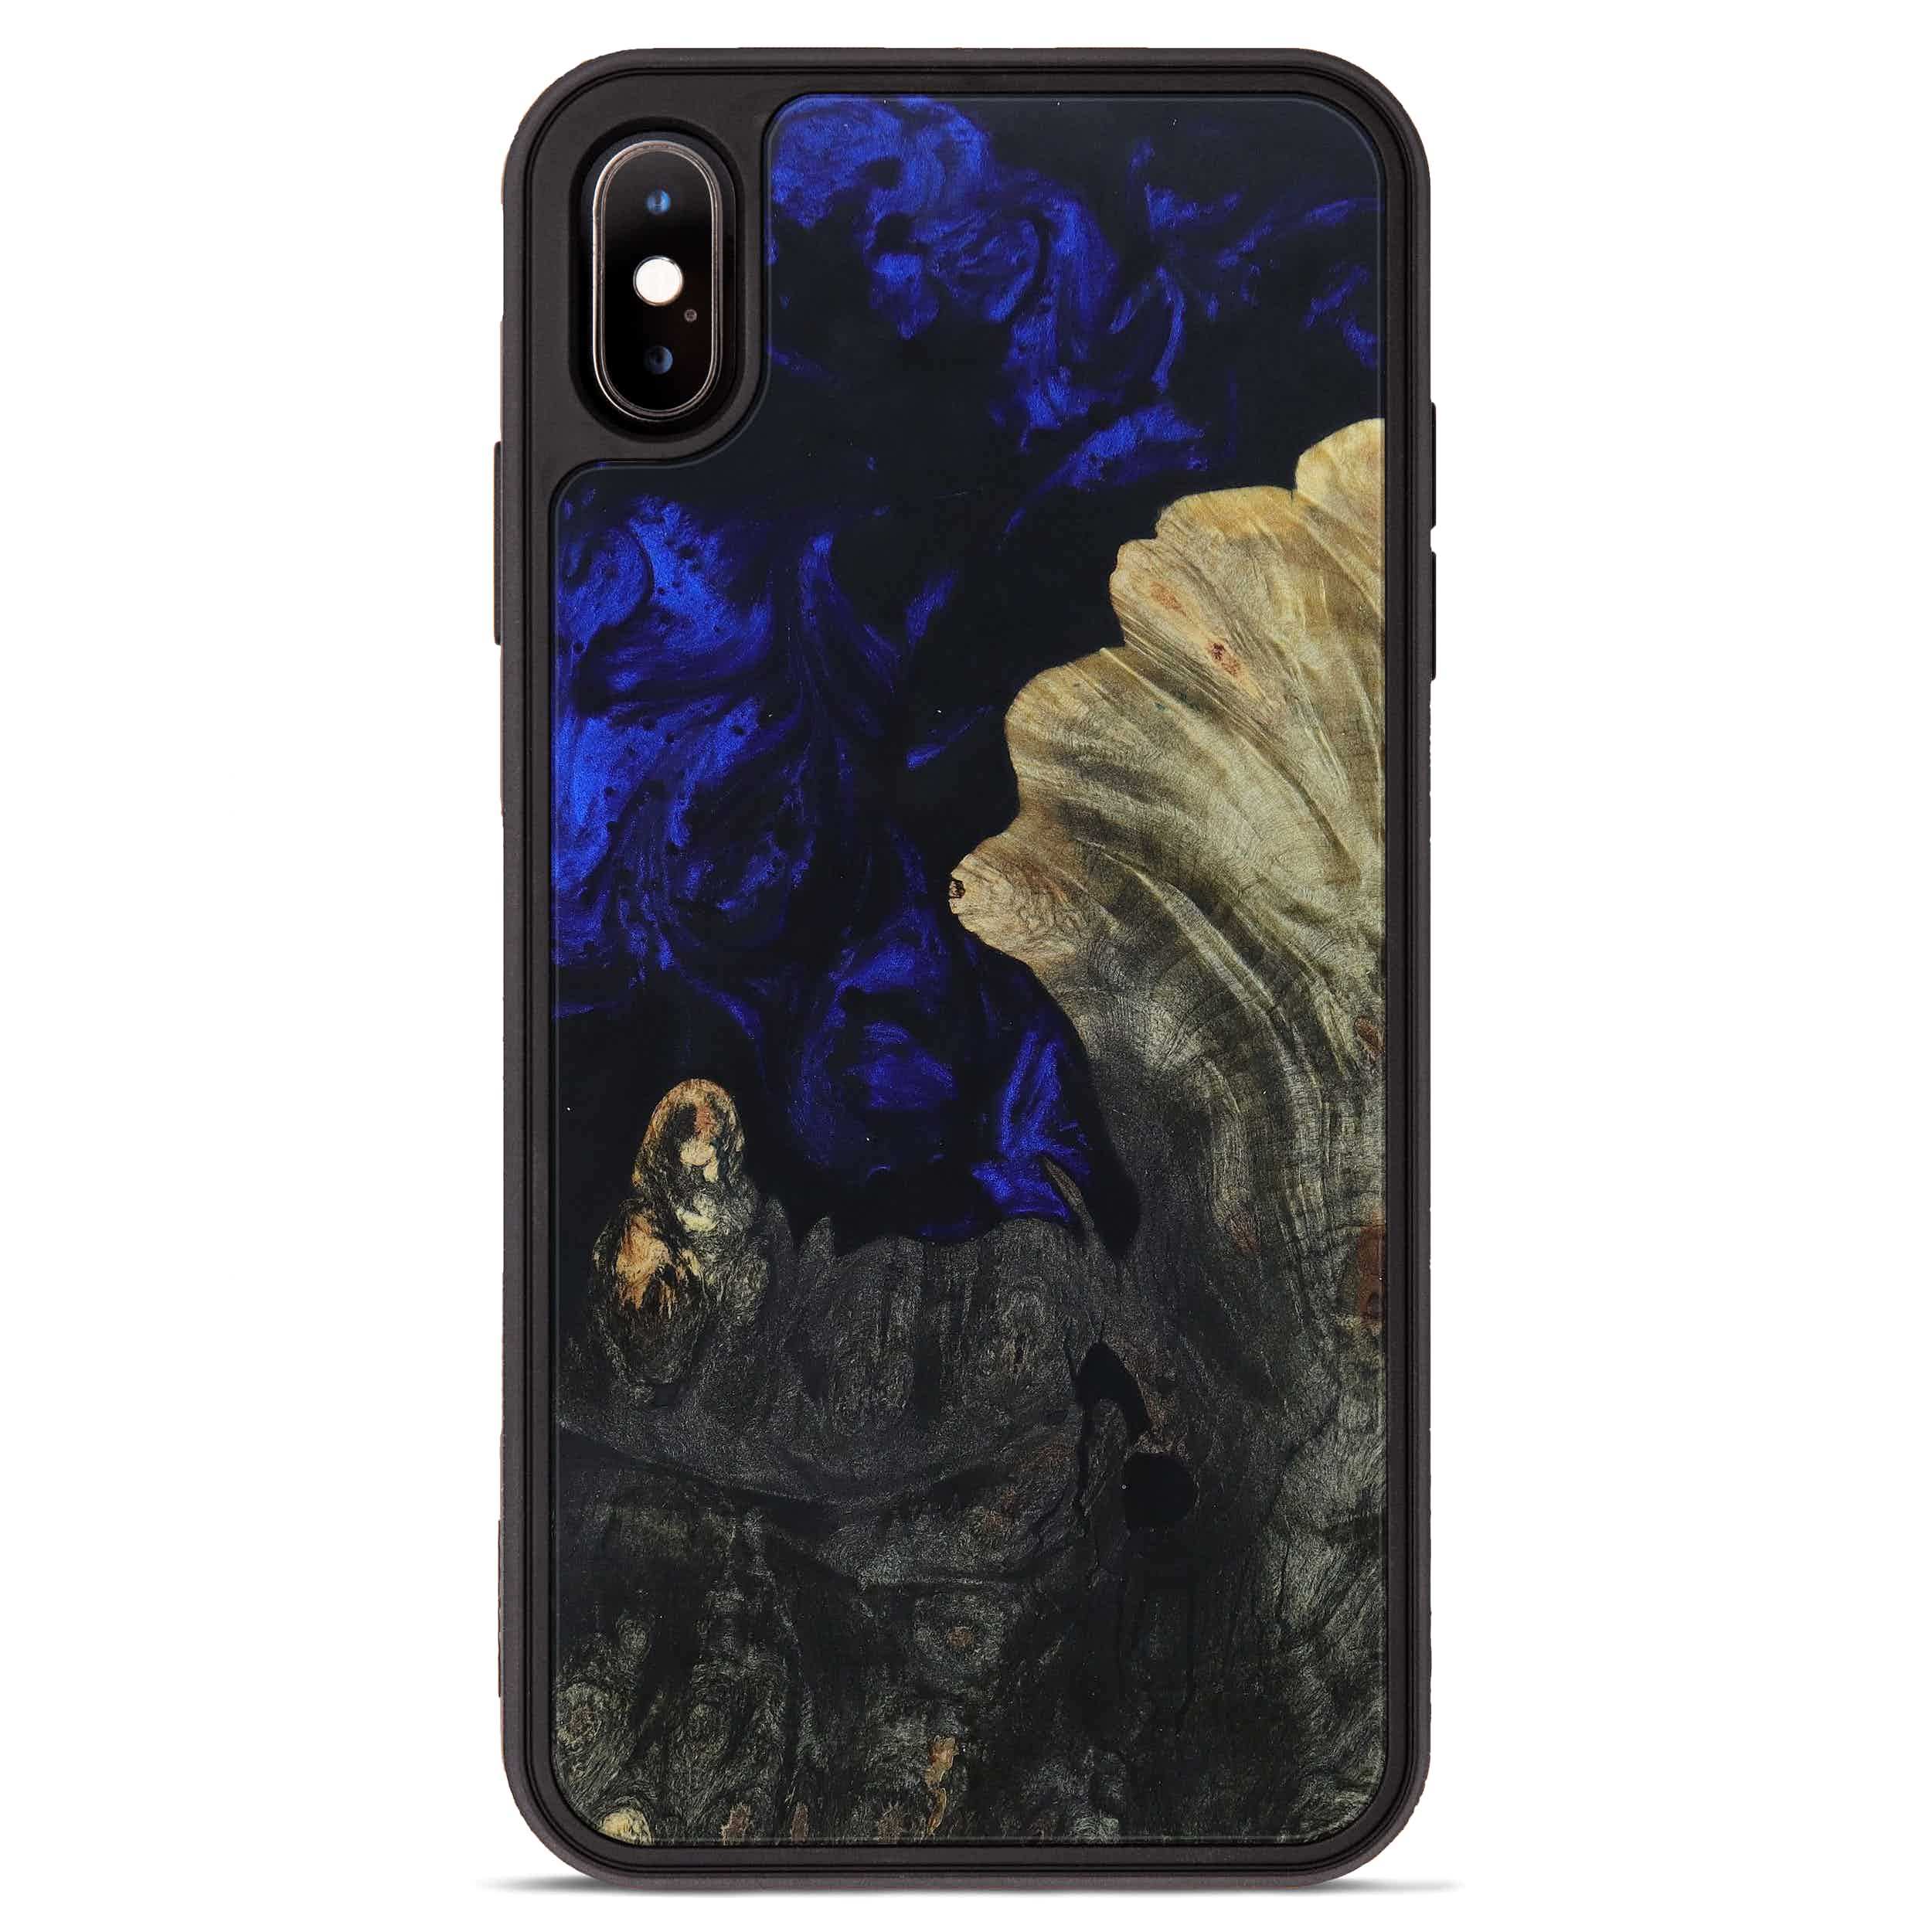 iPhone Xs Max Wood+Resin Phone Case - Todd (Dark Blue, 396131)